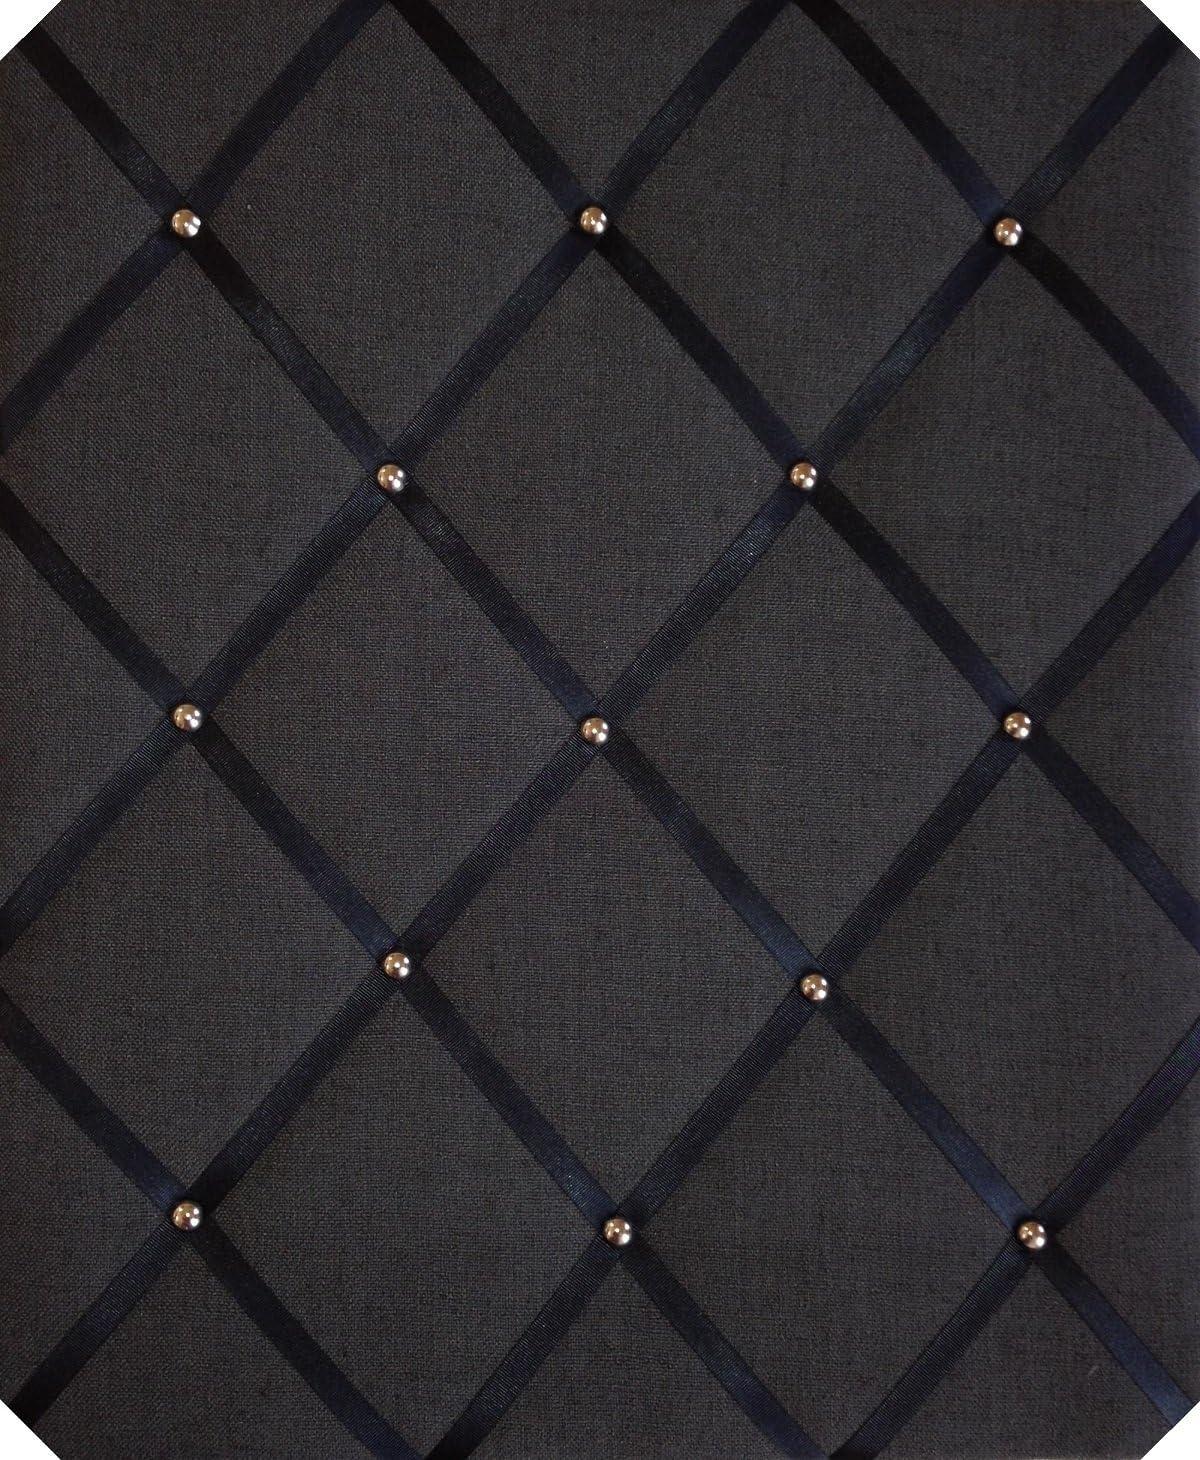 Notice ついに再販開始 Boards Large 40x48cm 売れ筋 Black Linen Cri Studs with Chrome